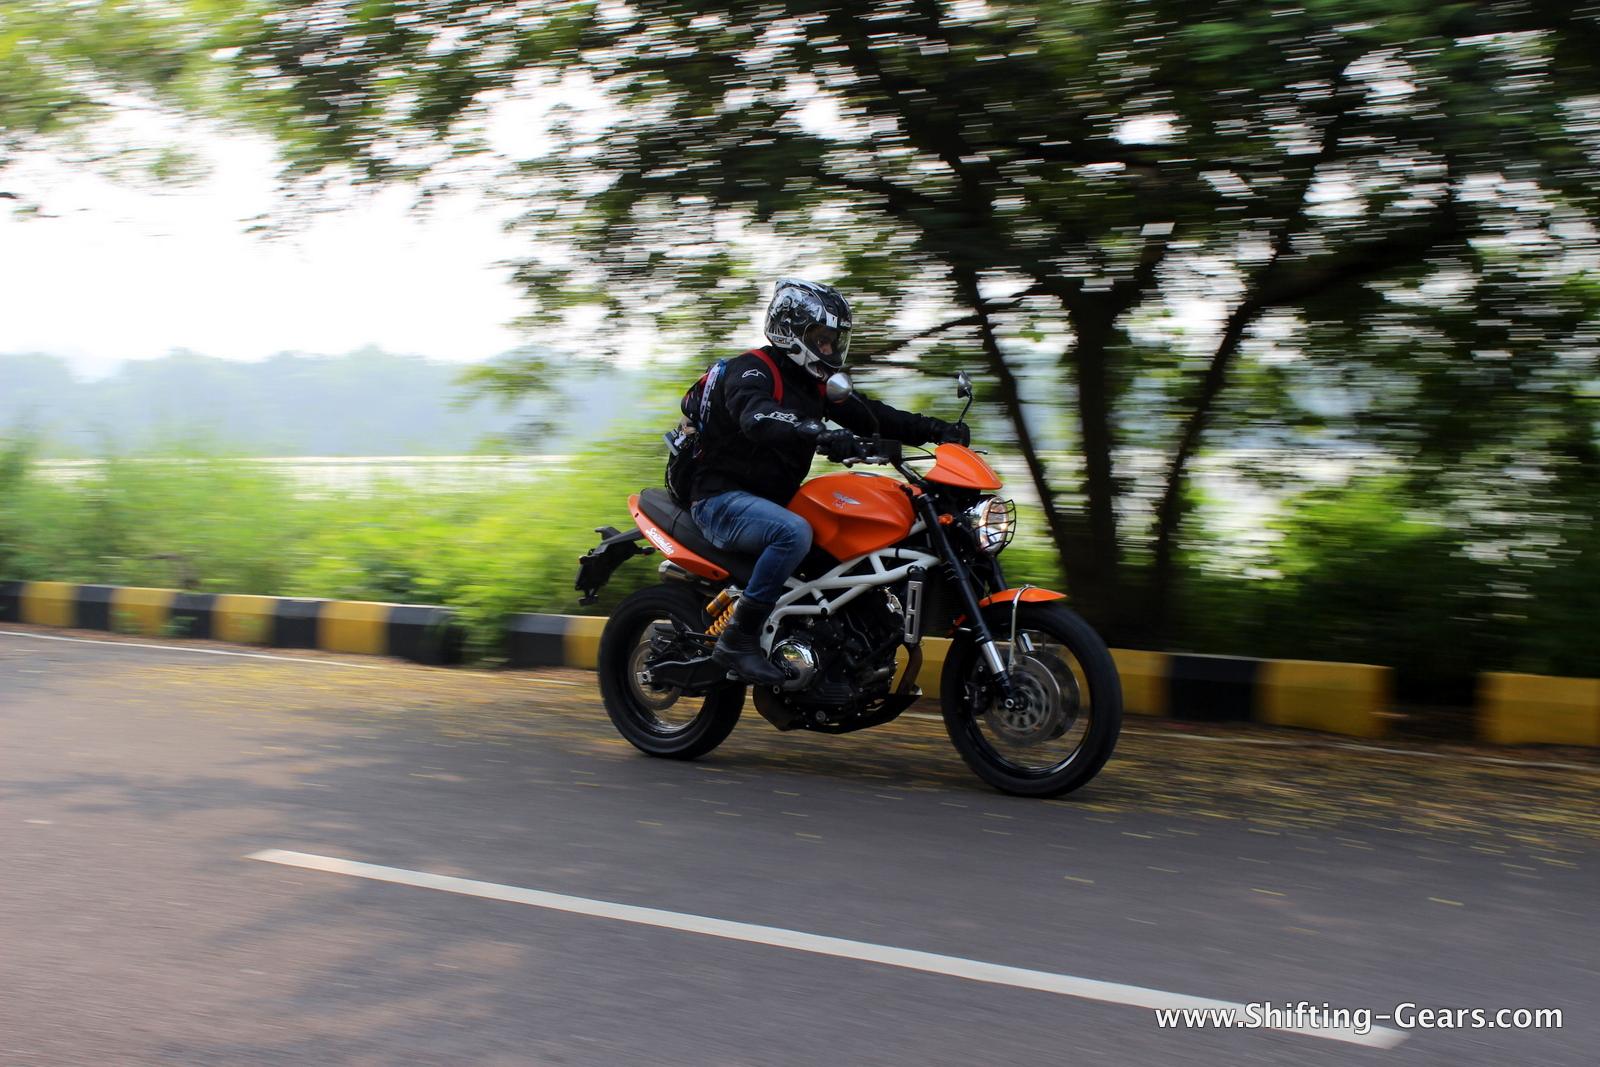 Bikes brought to India via the CBU route